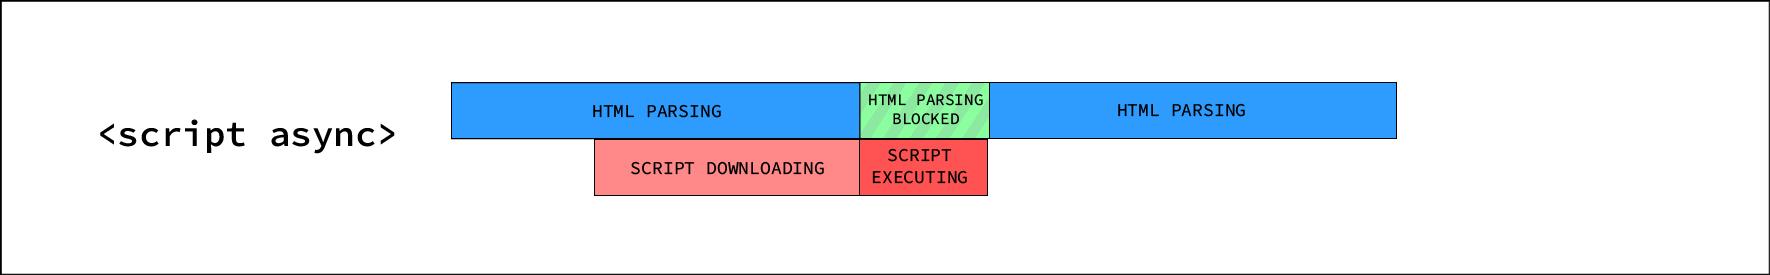 Asynchronous script execution